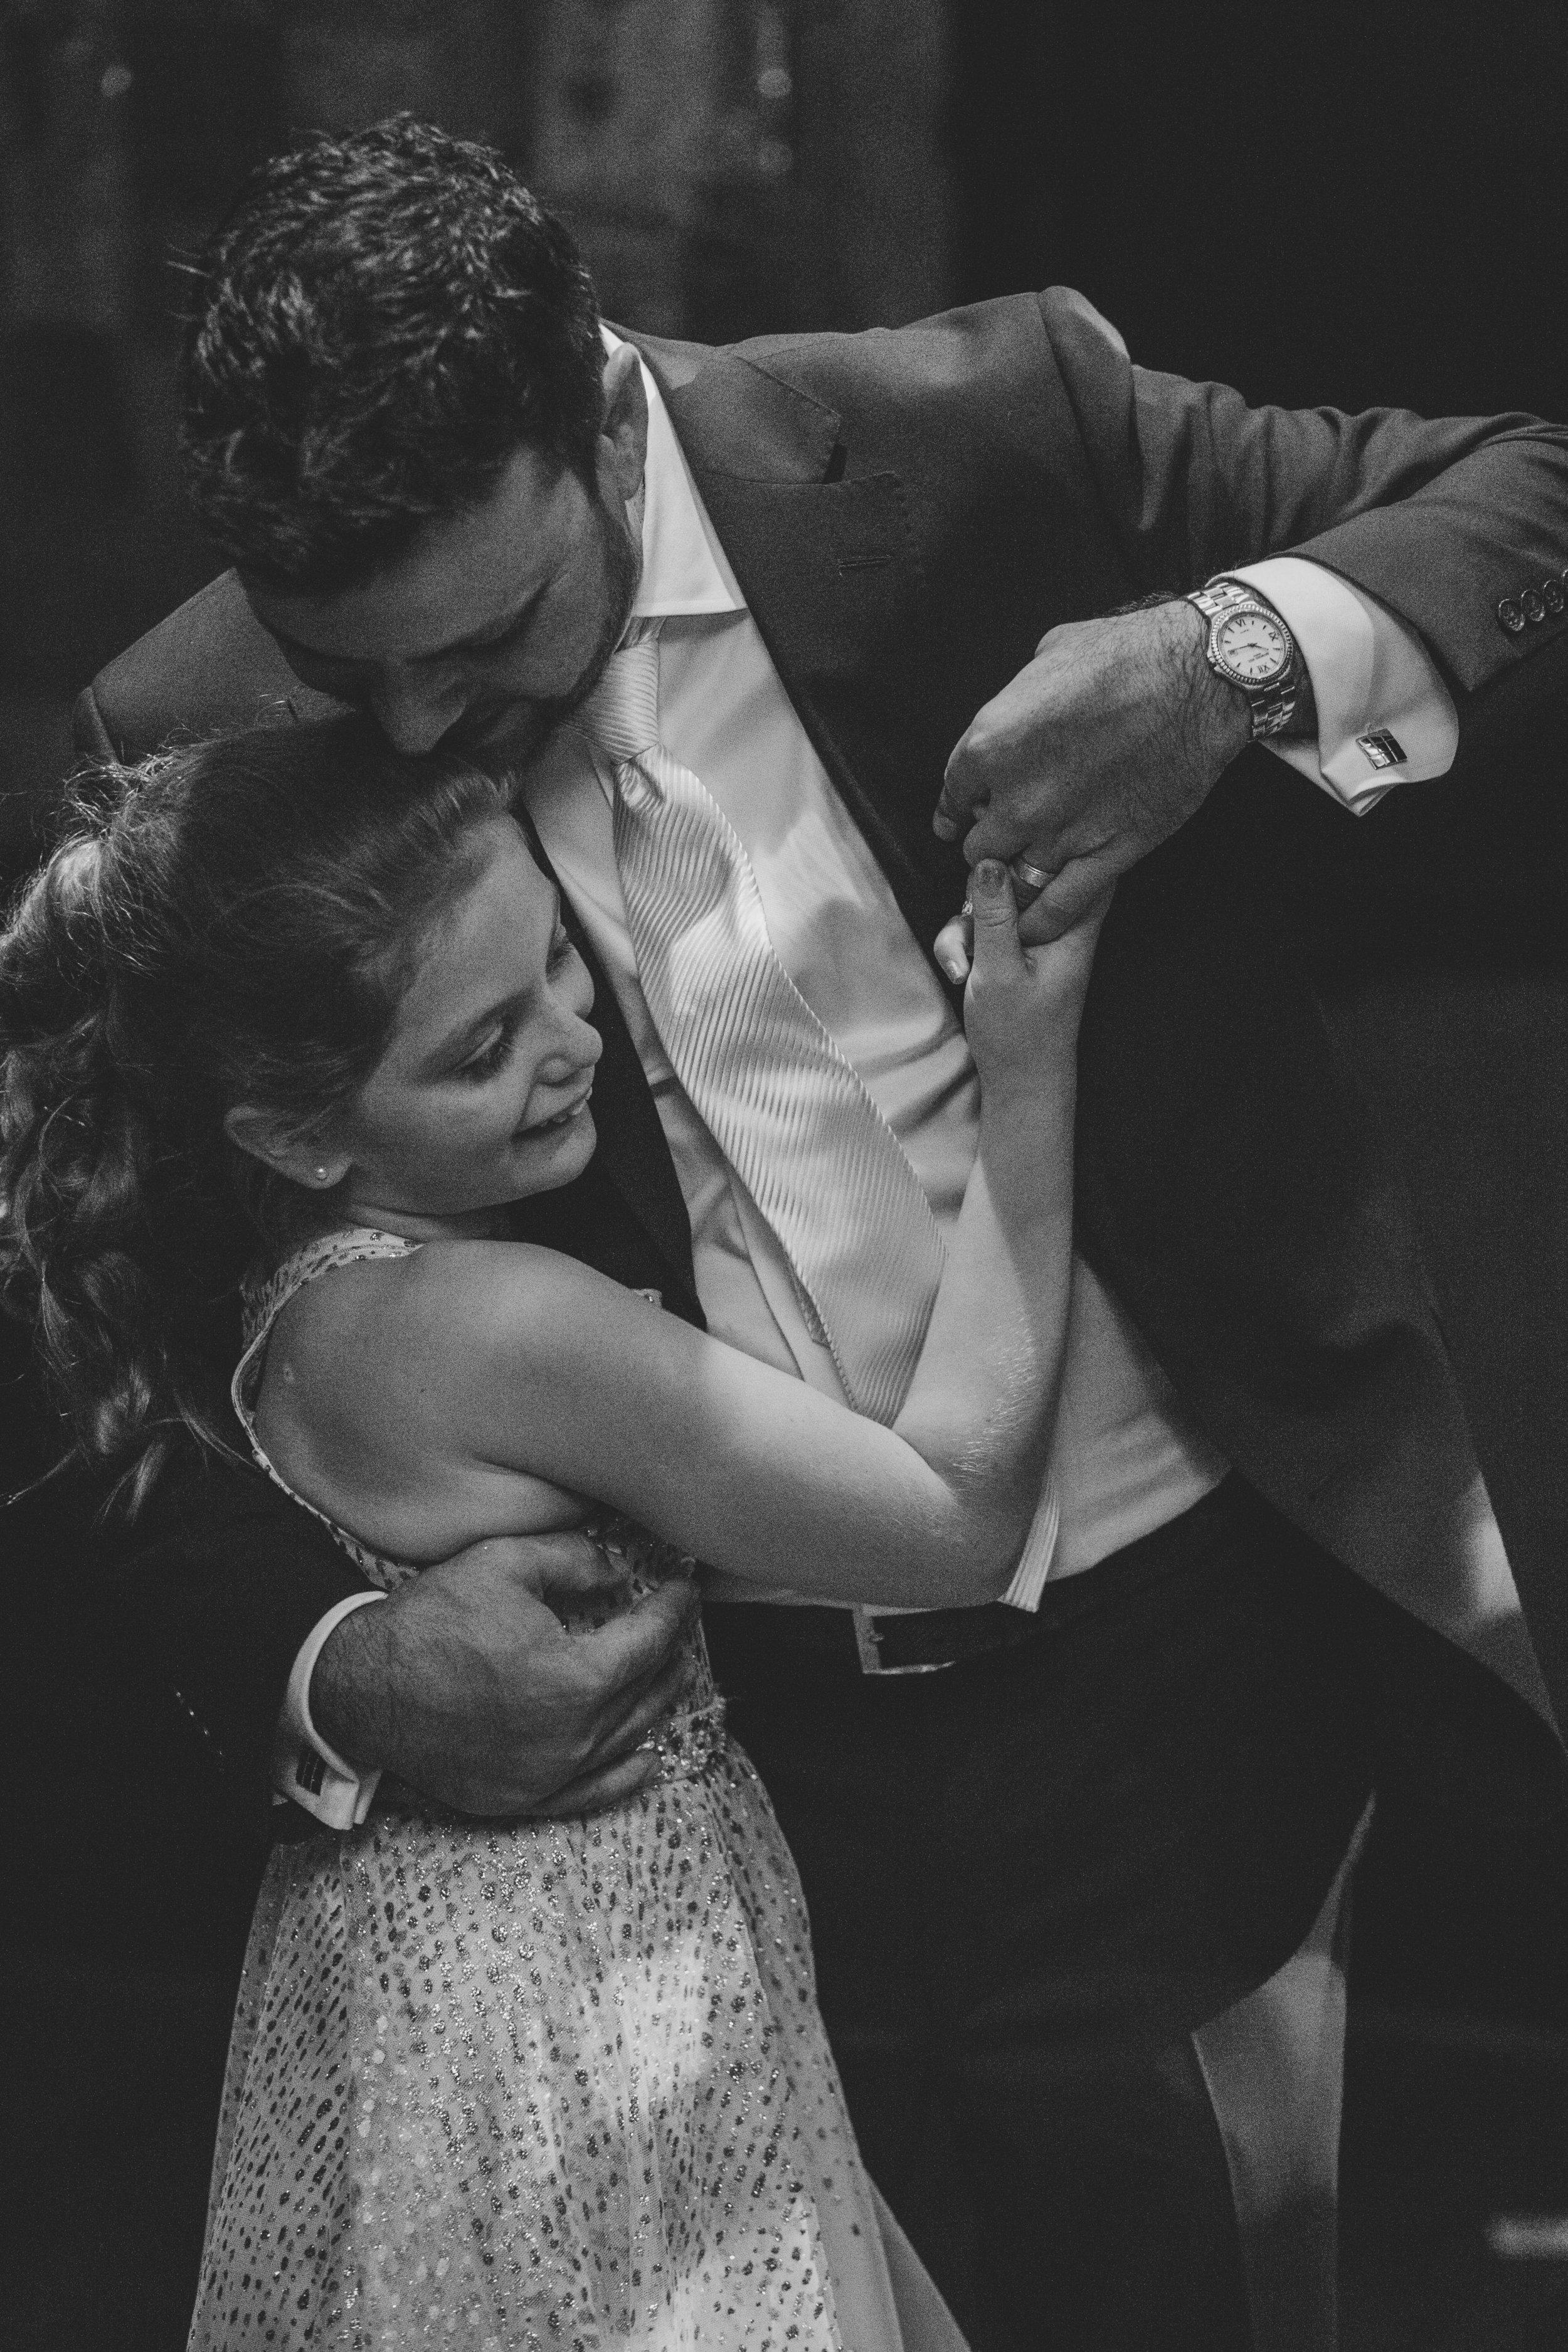 ATGI_Kat and Gabe Wedding 2016_2S8A6037.jpg